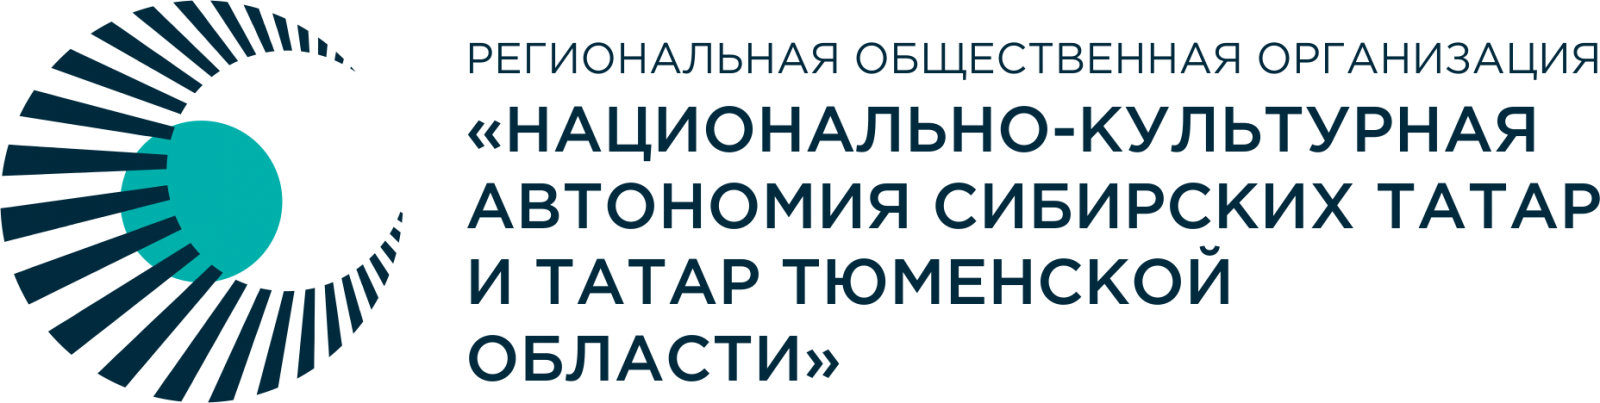 ТТО_лого_полноцвет(png) (2)